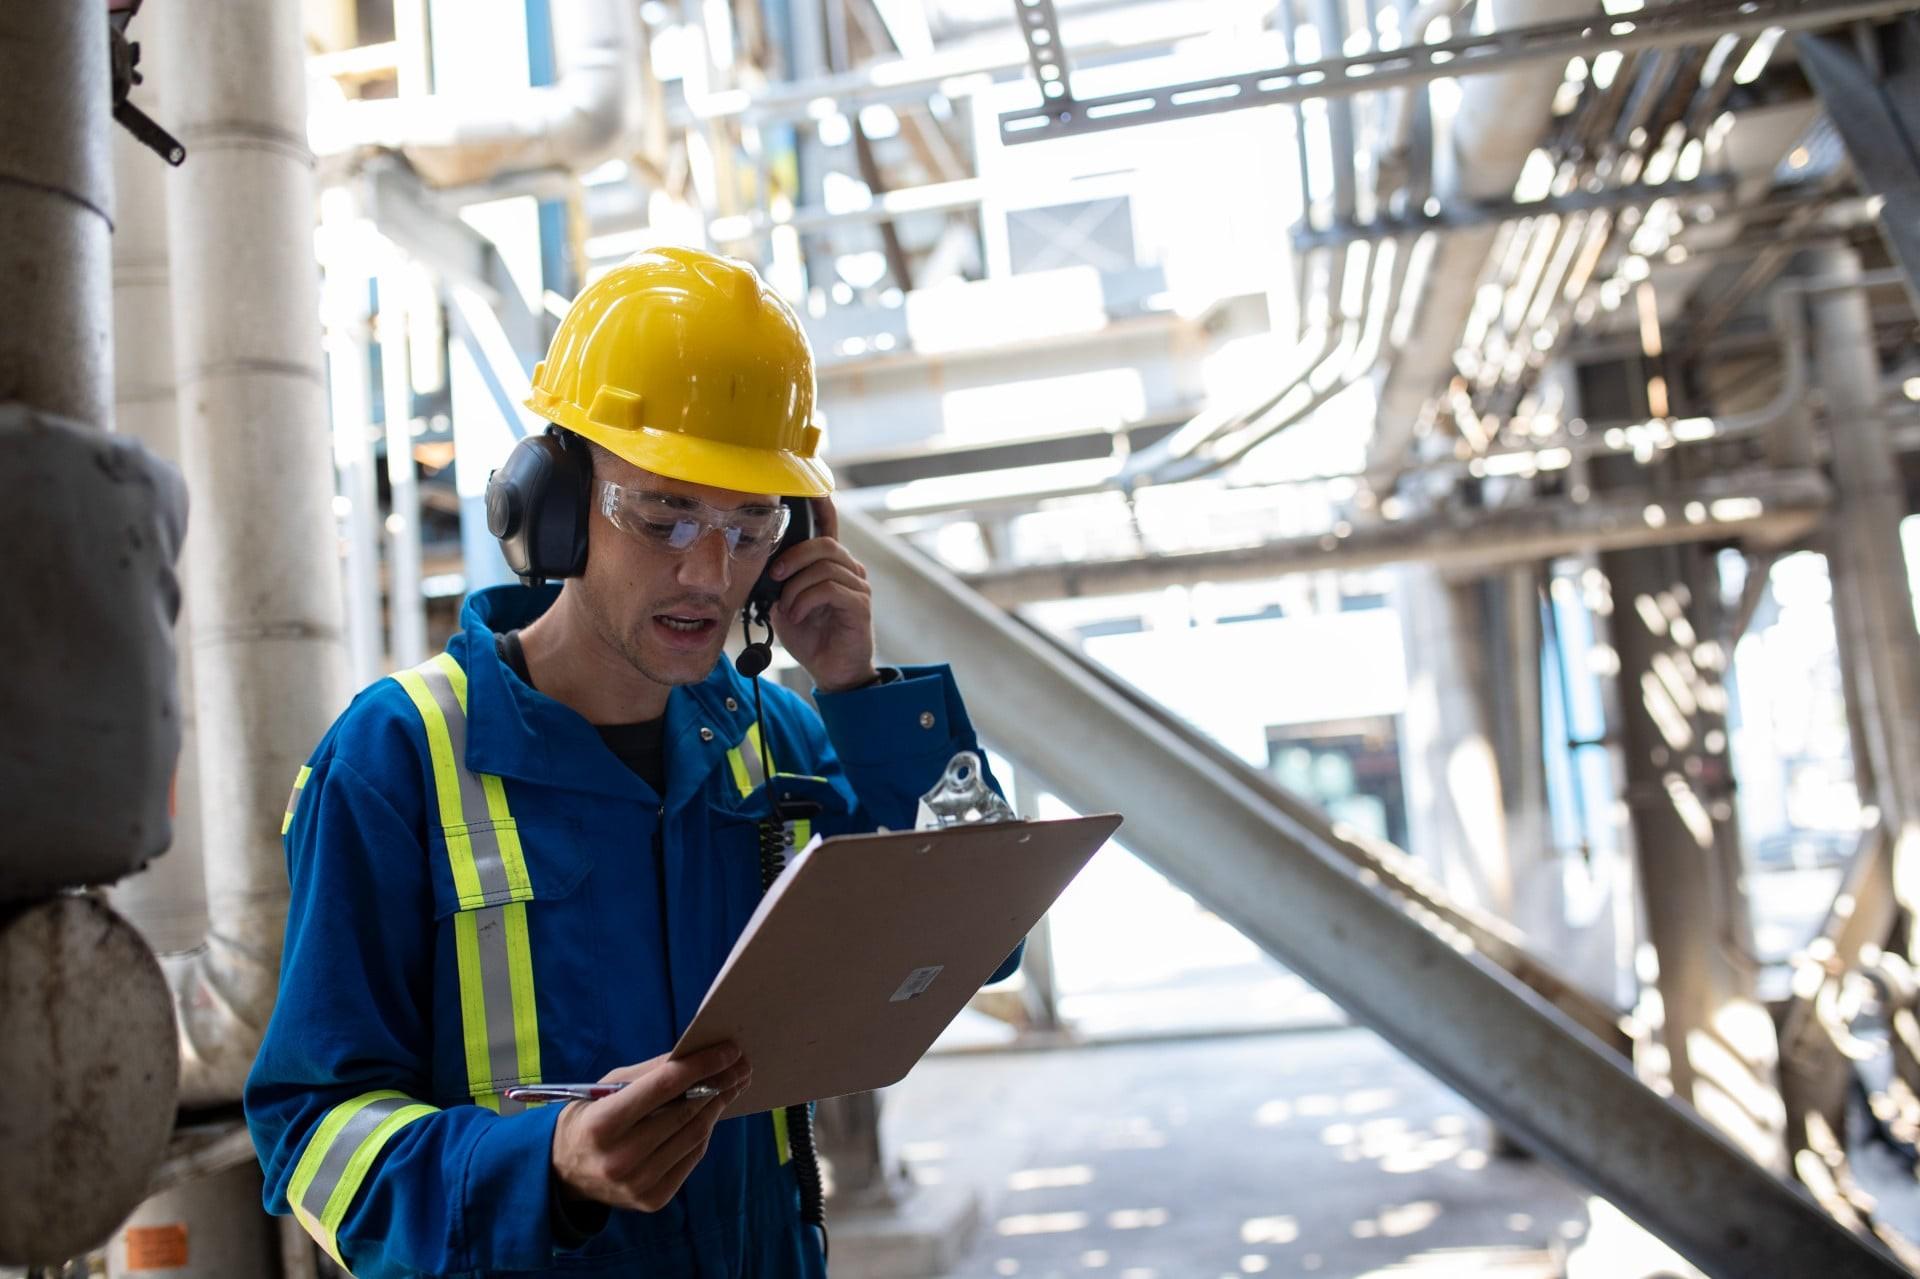 worker using heavy duty headset for intelligent audio